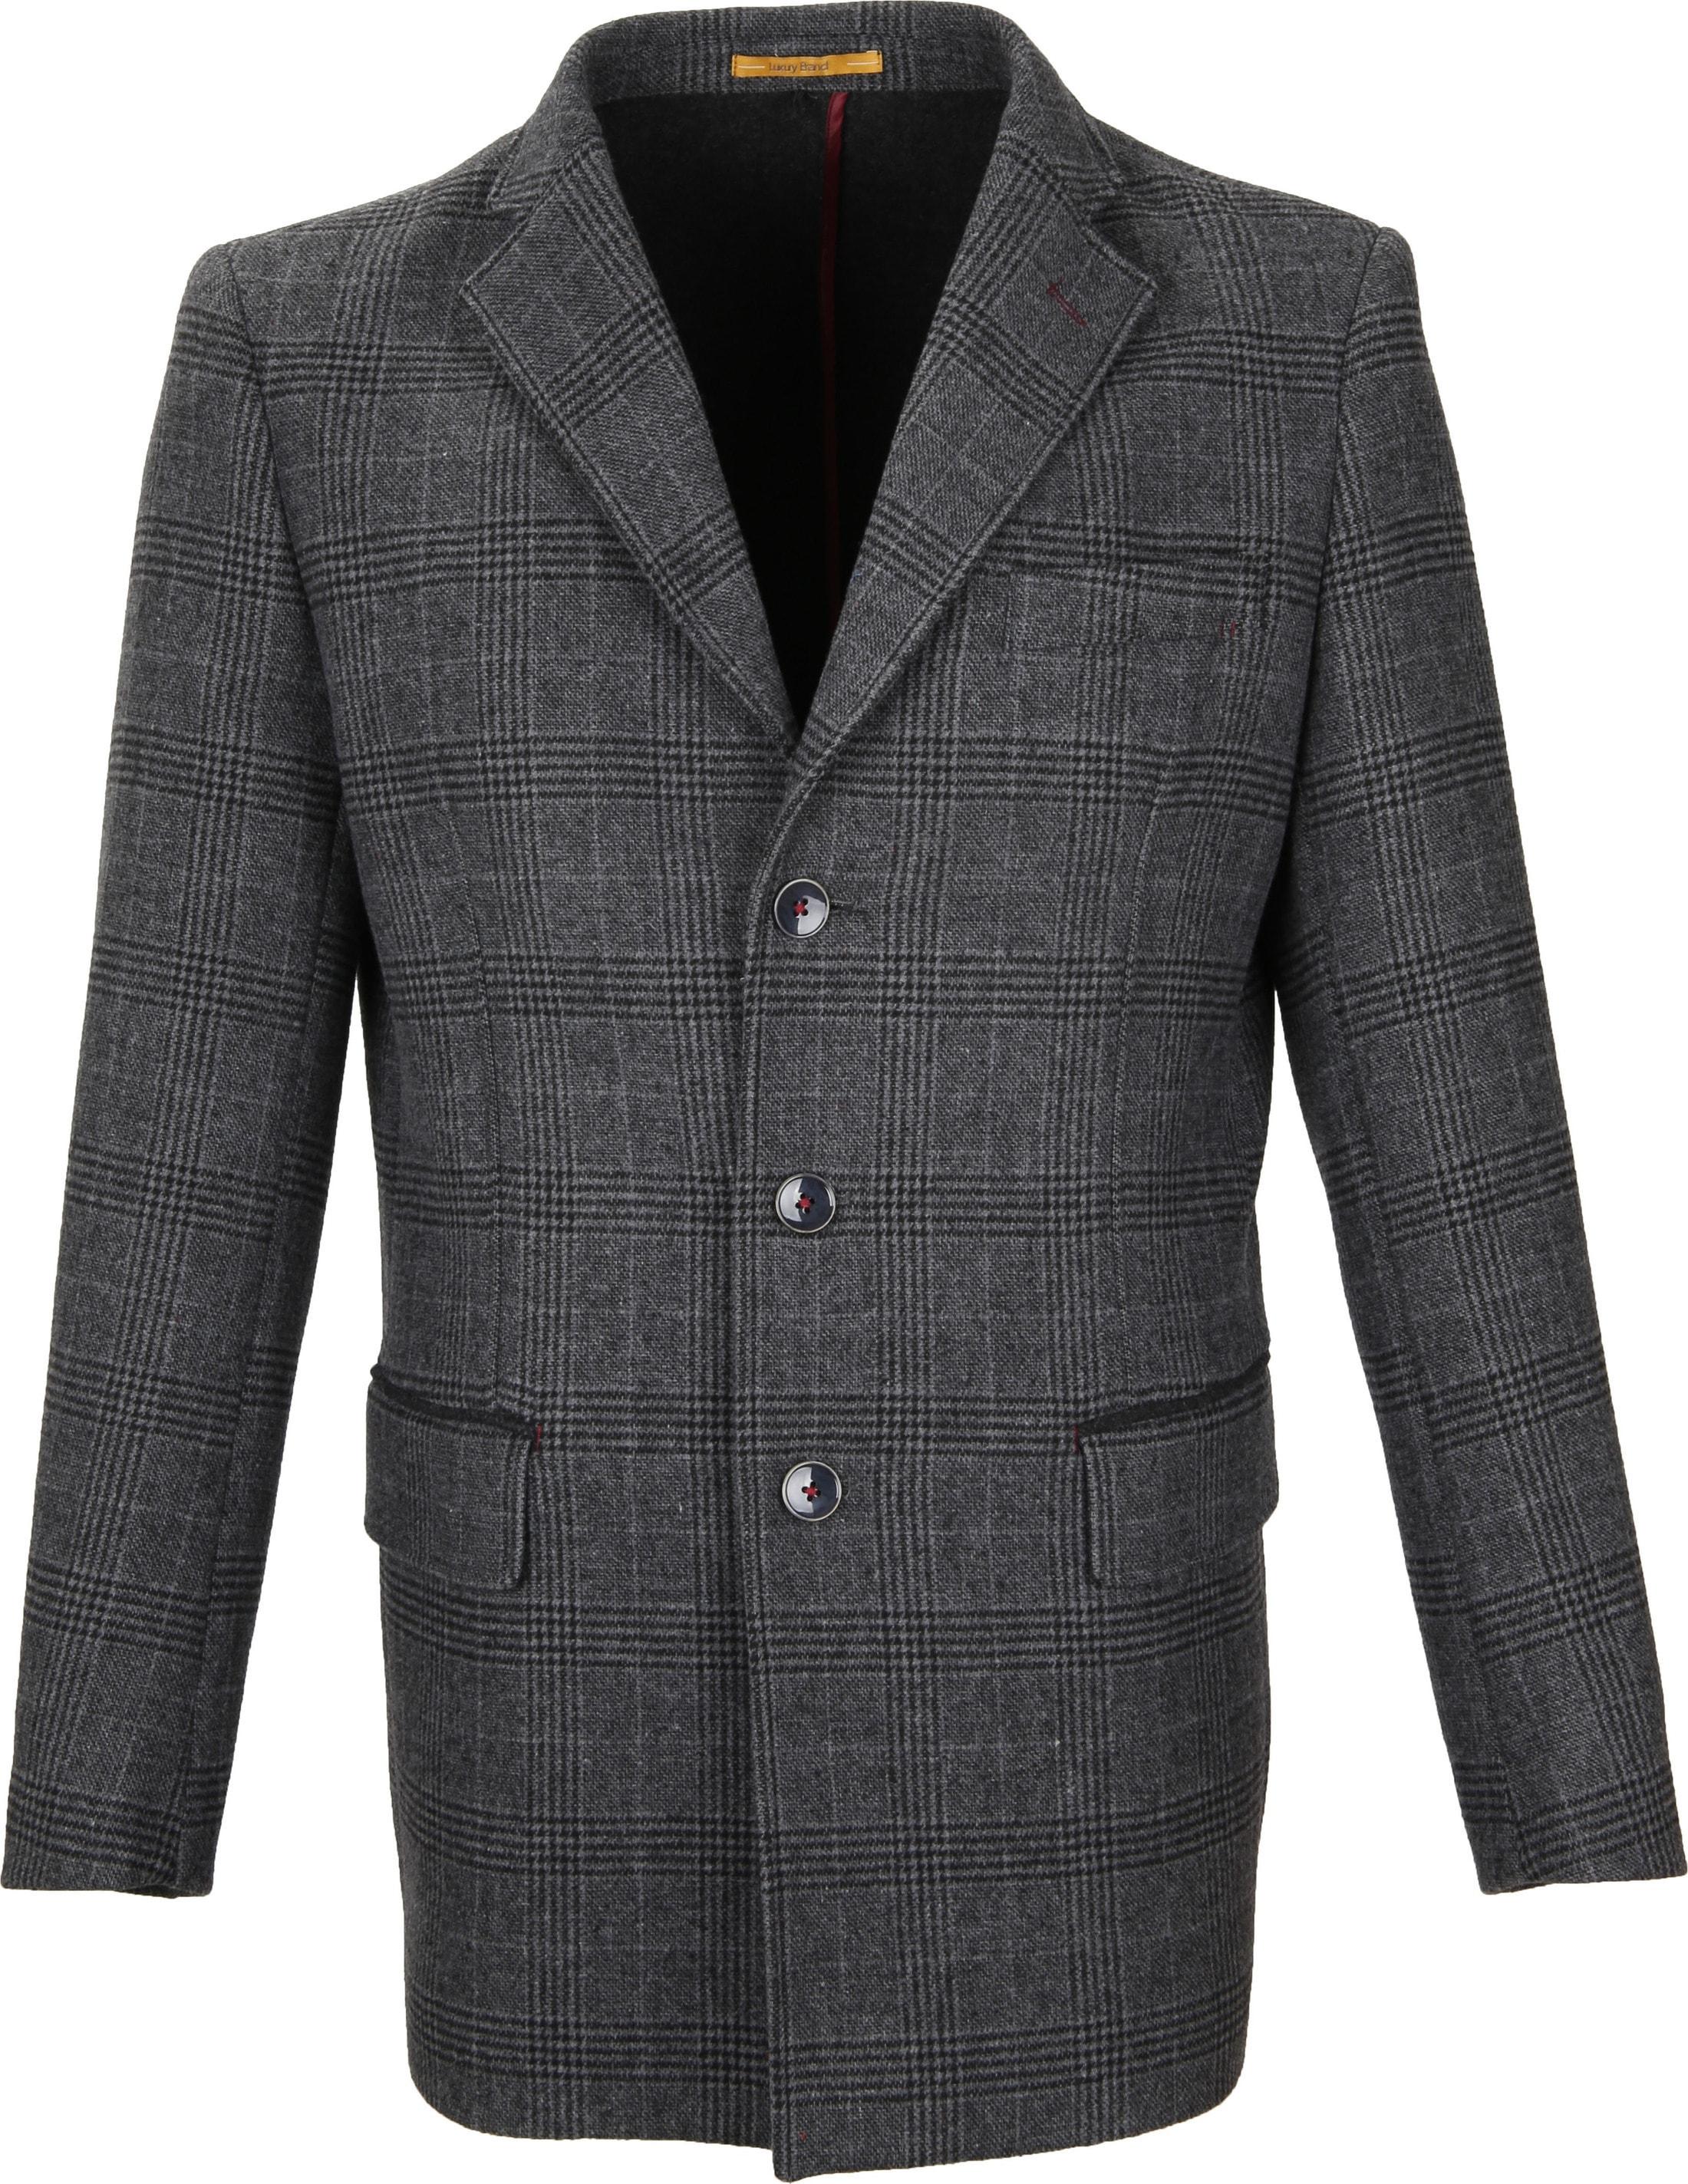 Suitable Coat Anton Antraciet foto 1